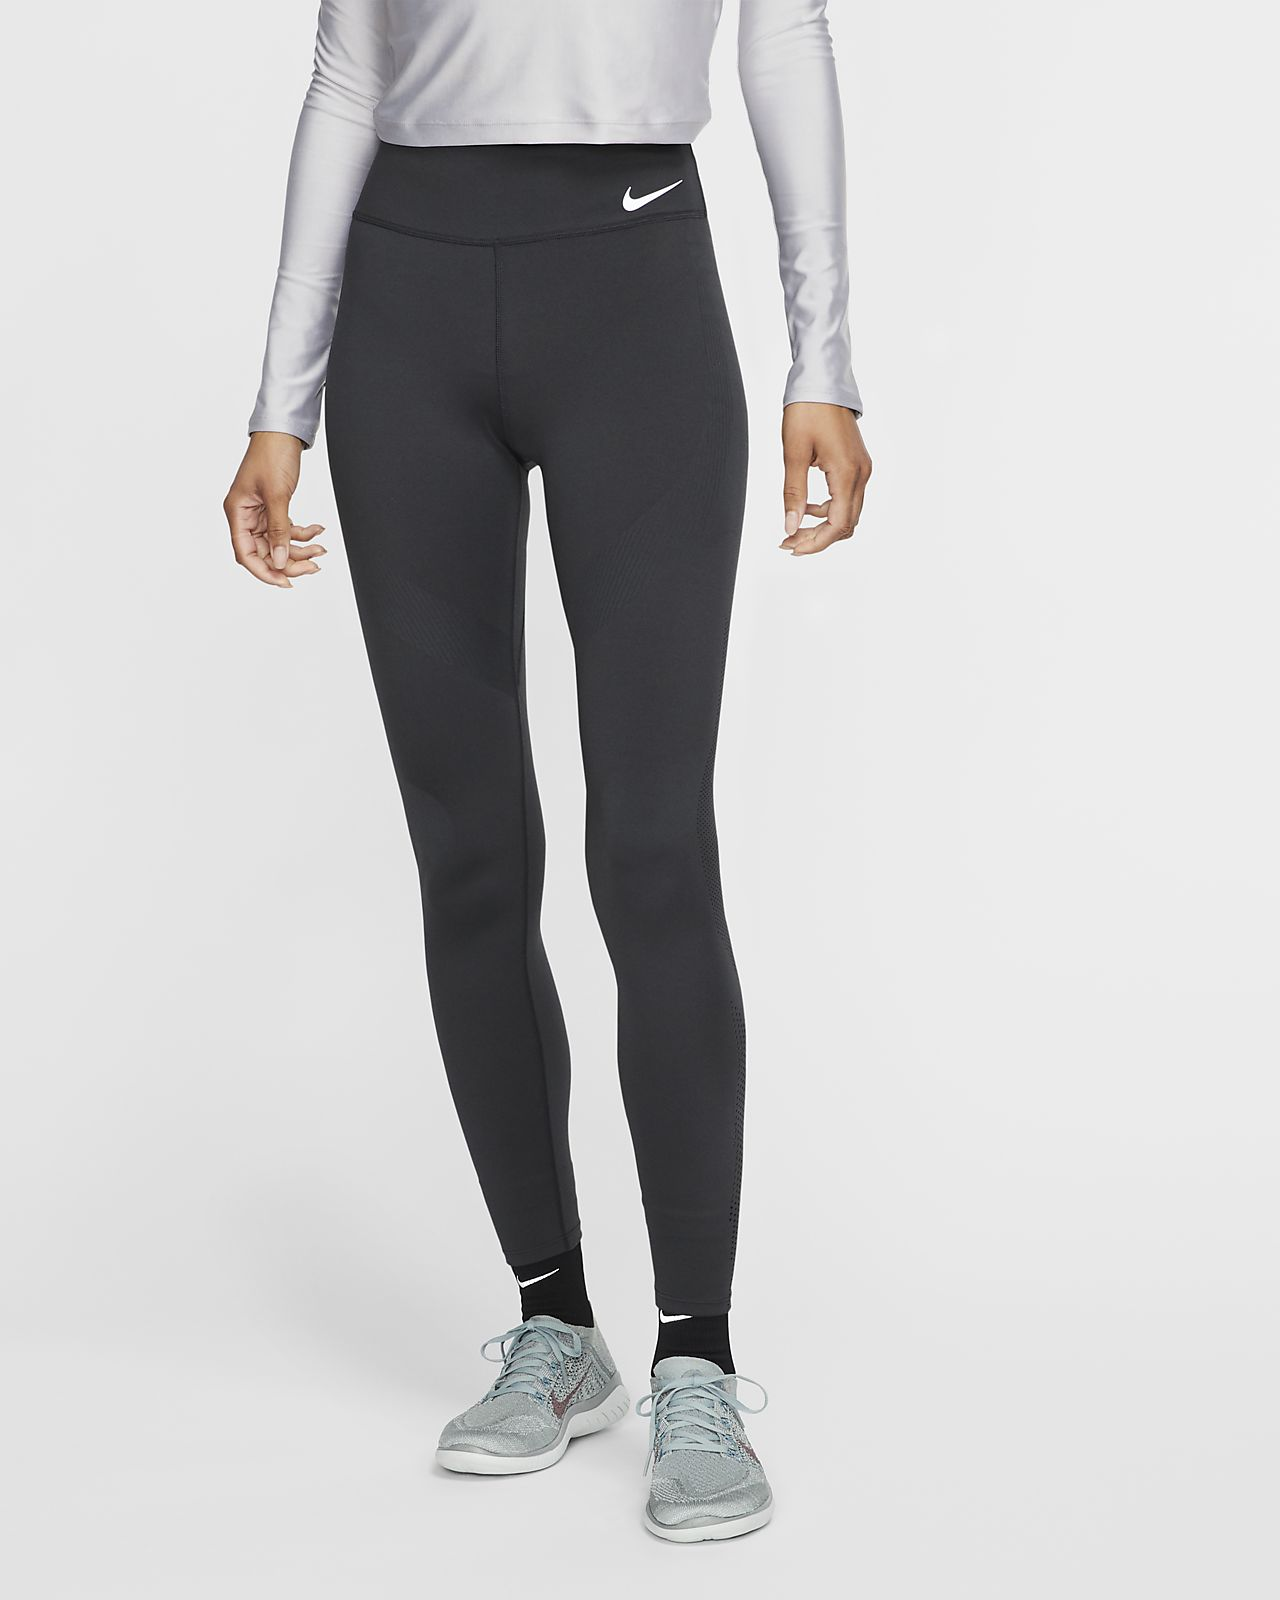 Nike Techknit Epic Lux Hardlooptights voor dames